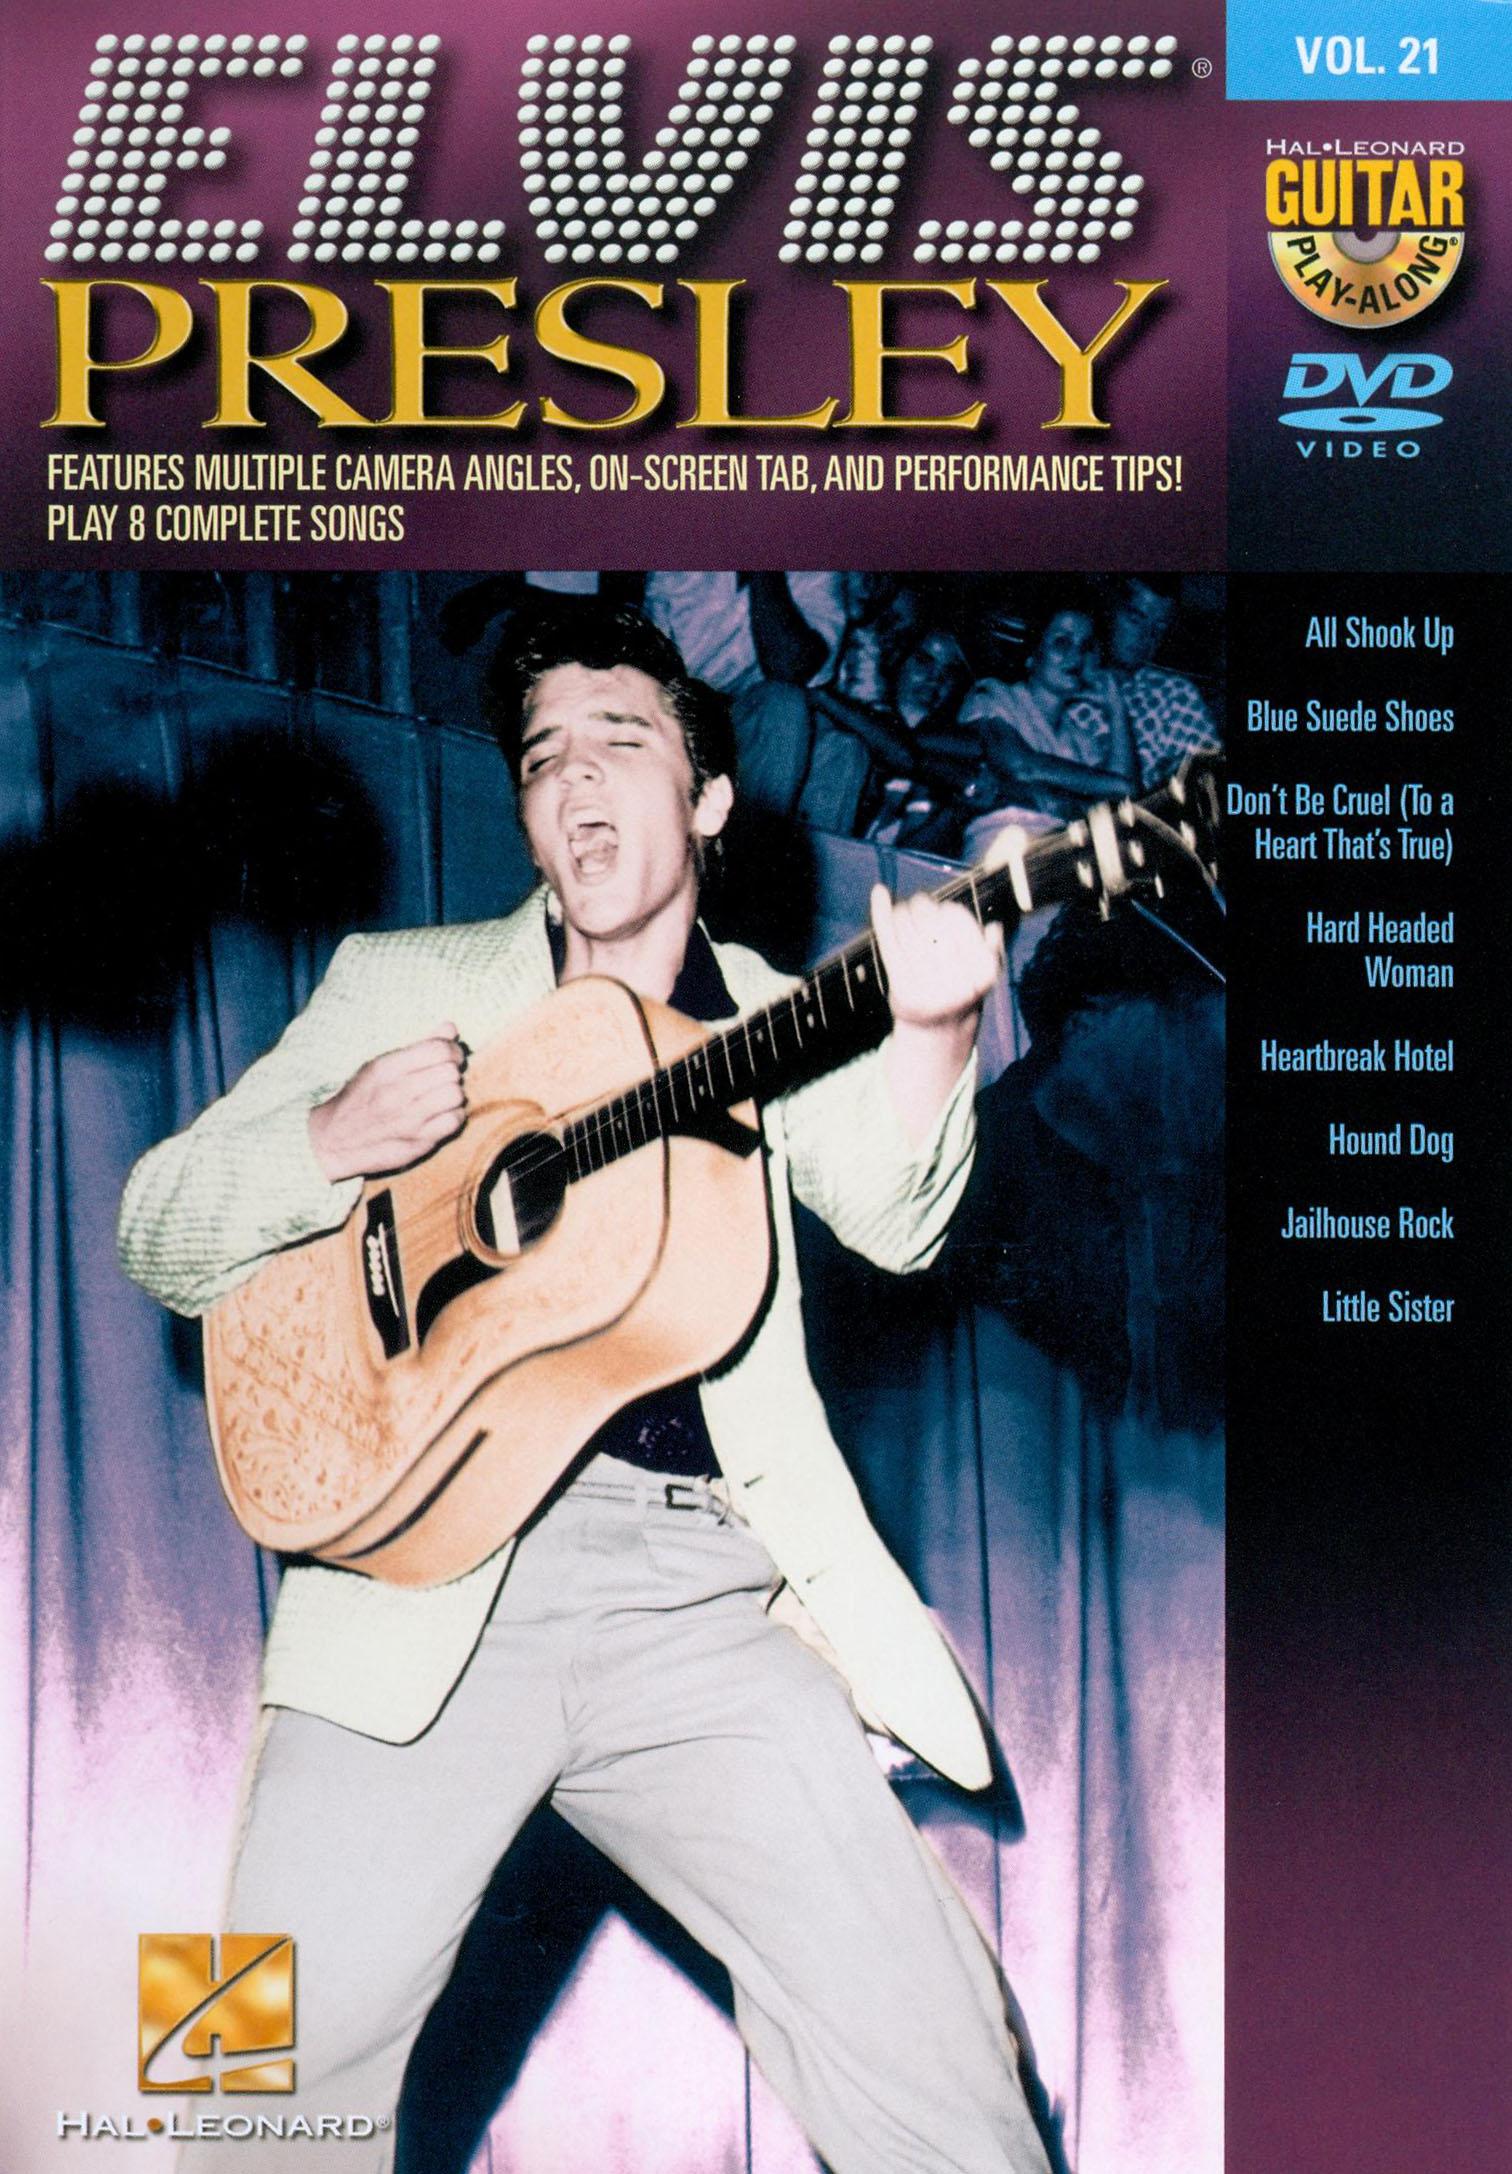 Guitar Play-Along, Vol. 21: Elvis Presley